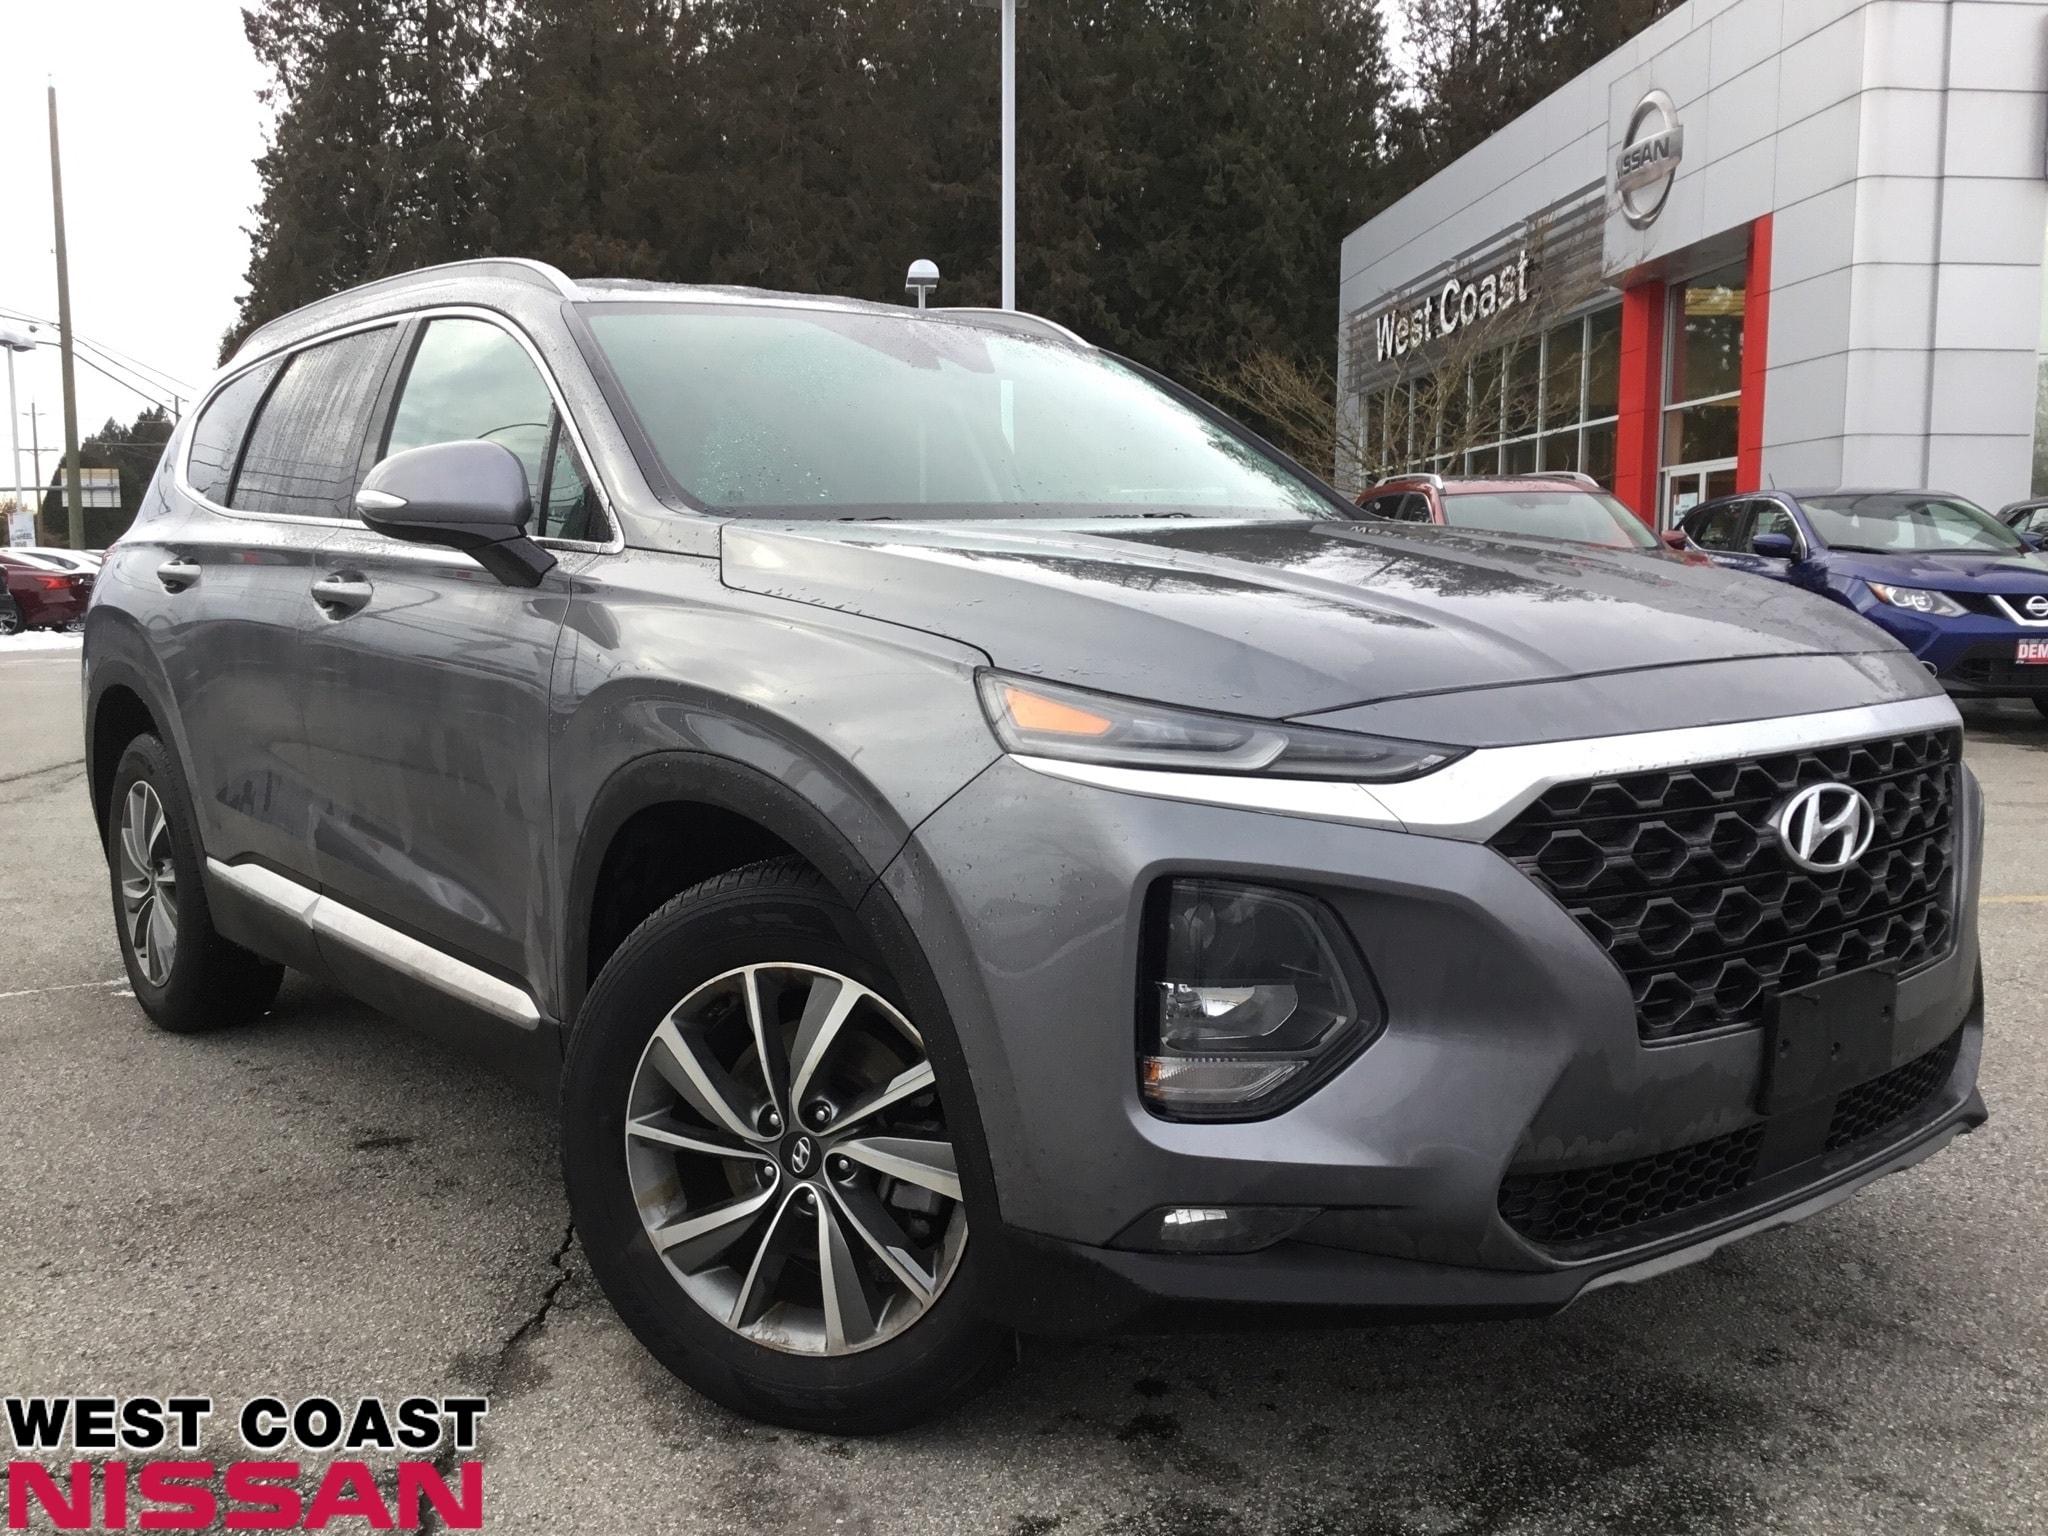 2019 Hyundai Santa Fe Sport Preferred 2.4L awd - local vehicle no accidents SUV